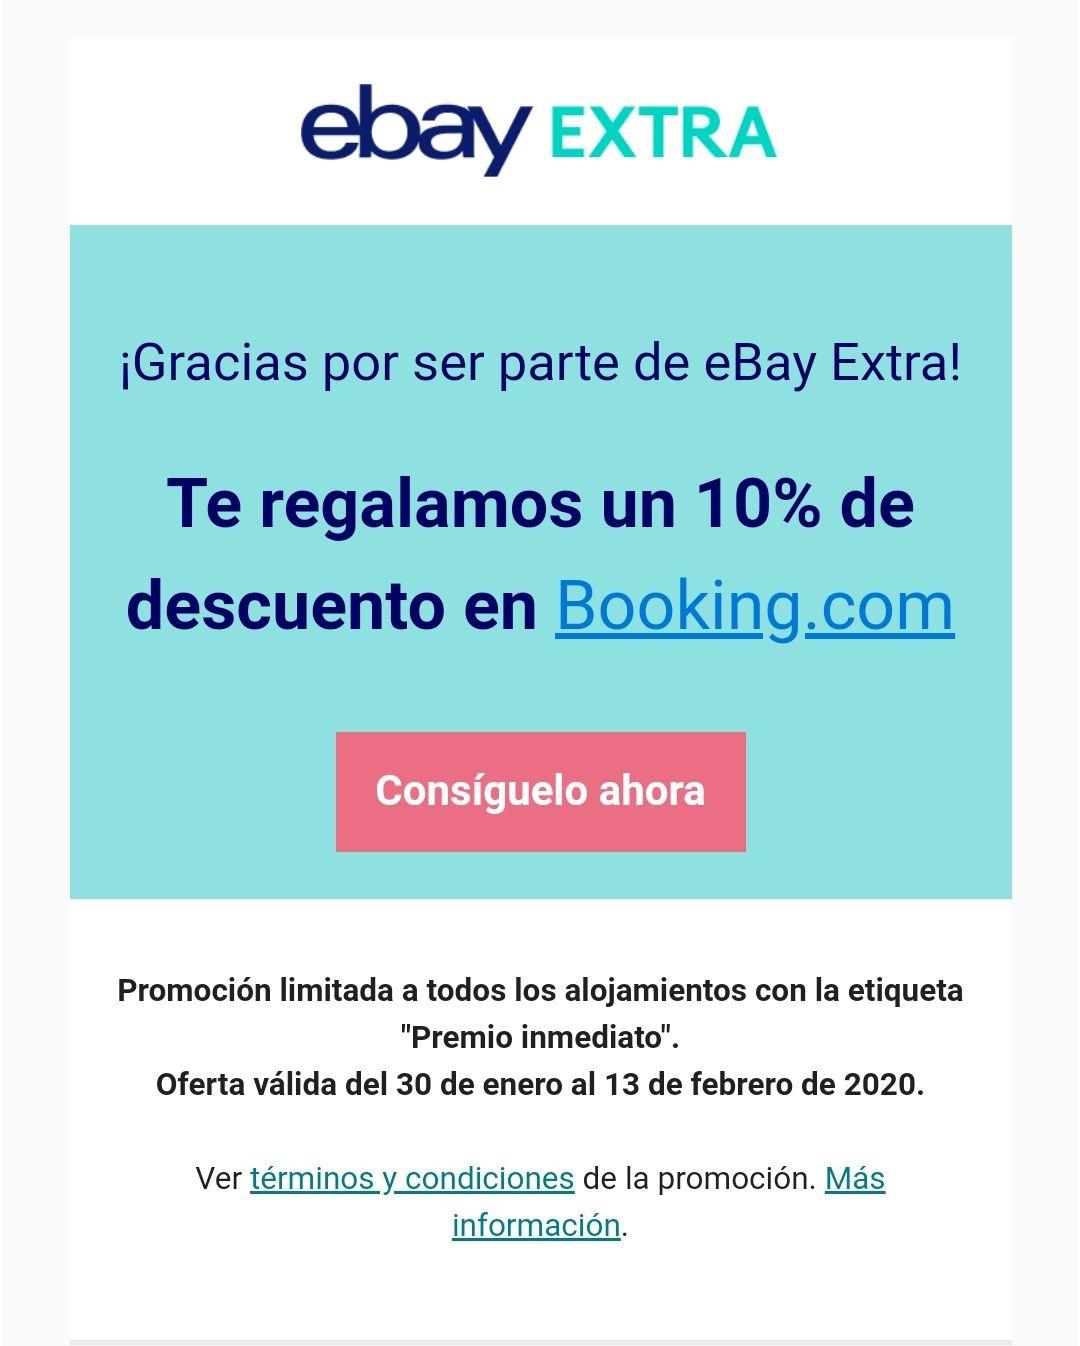 10% en hoteles seleccionados en Booking con eBay extra